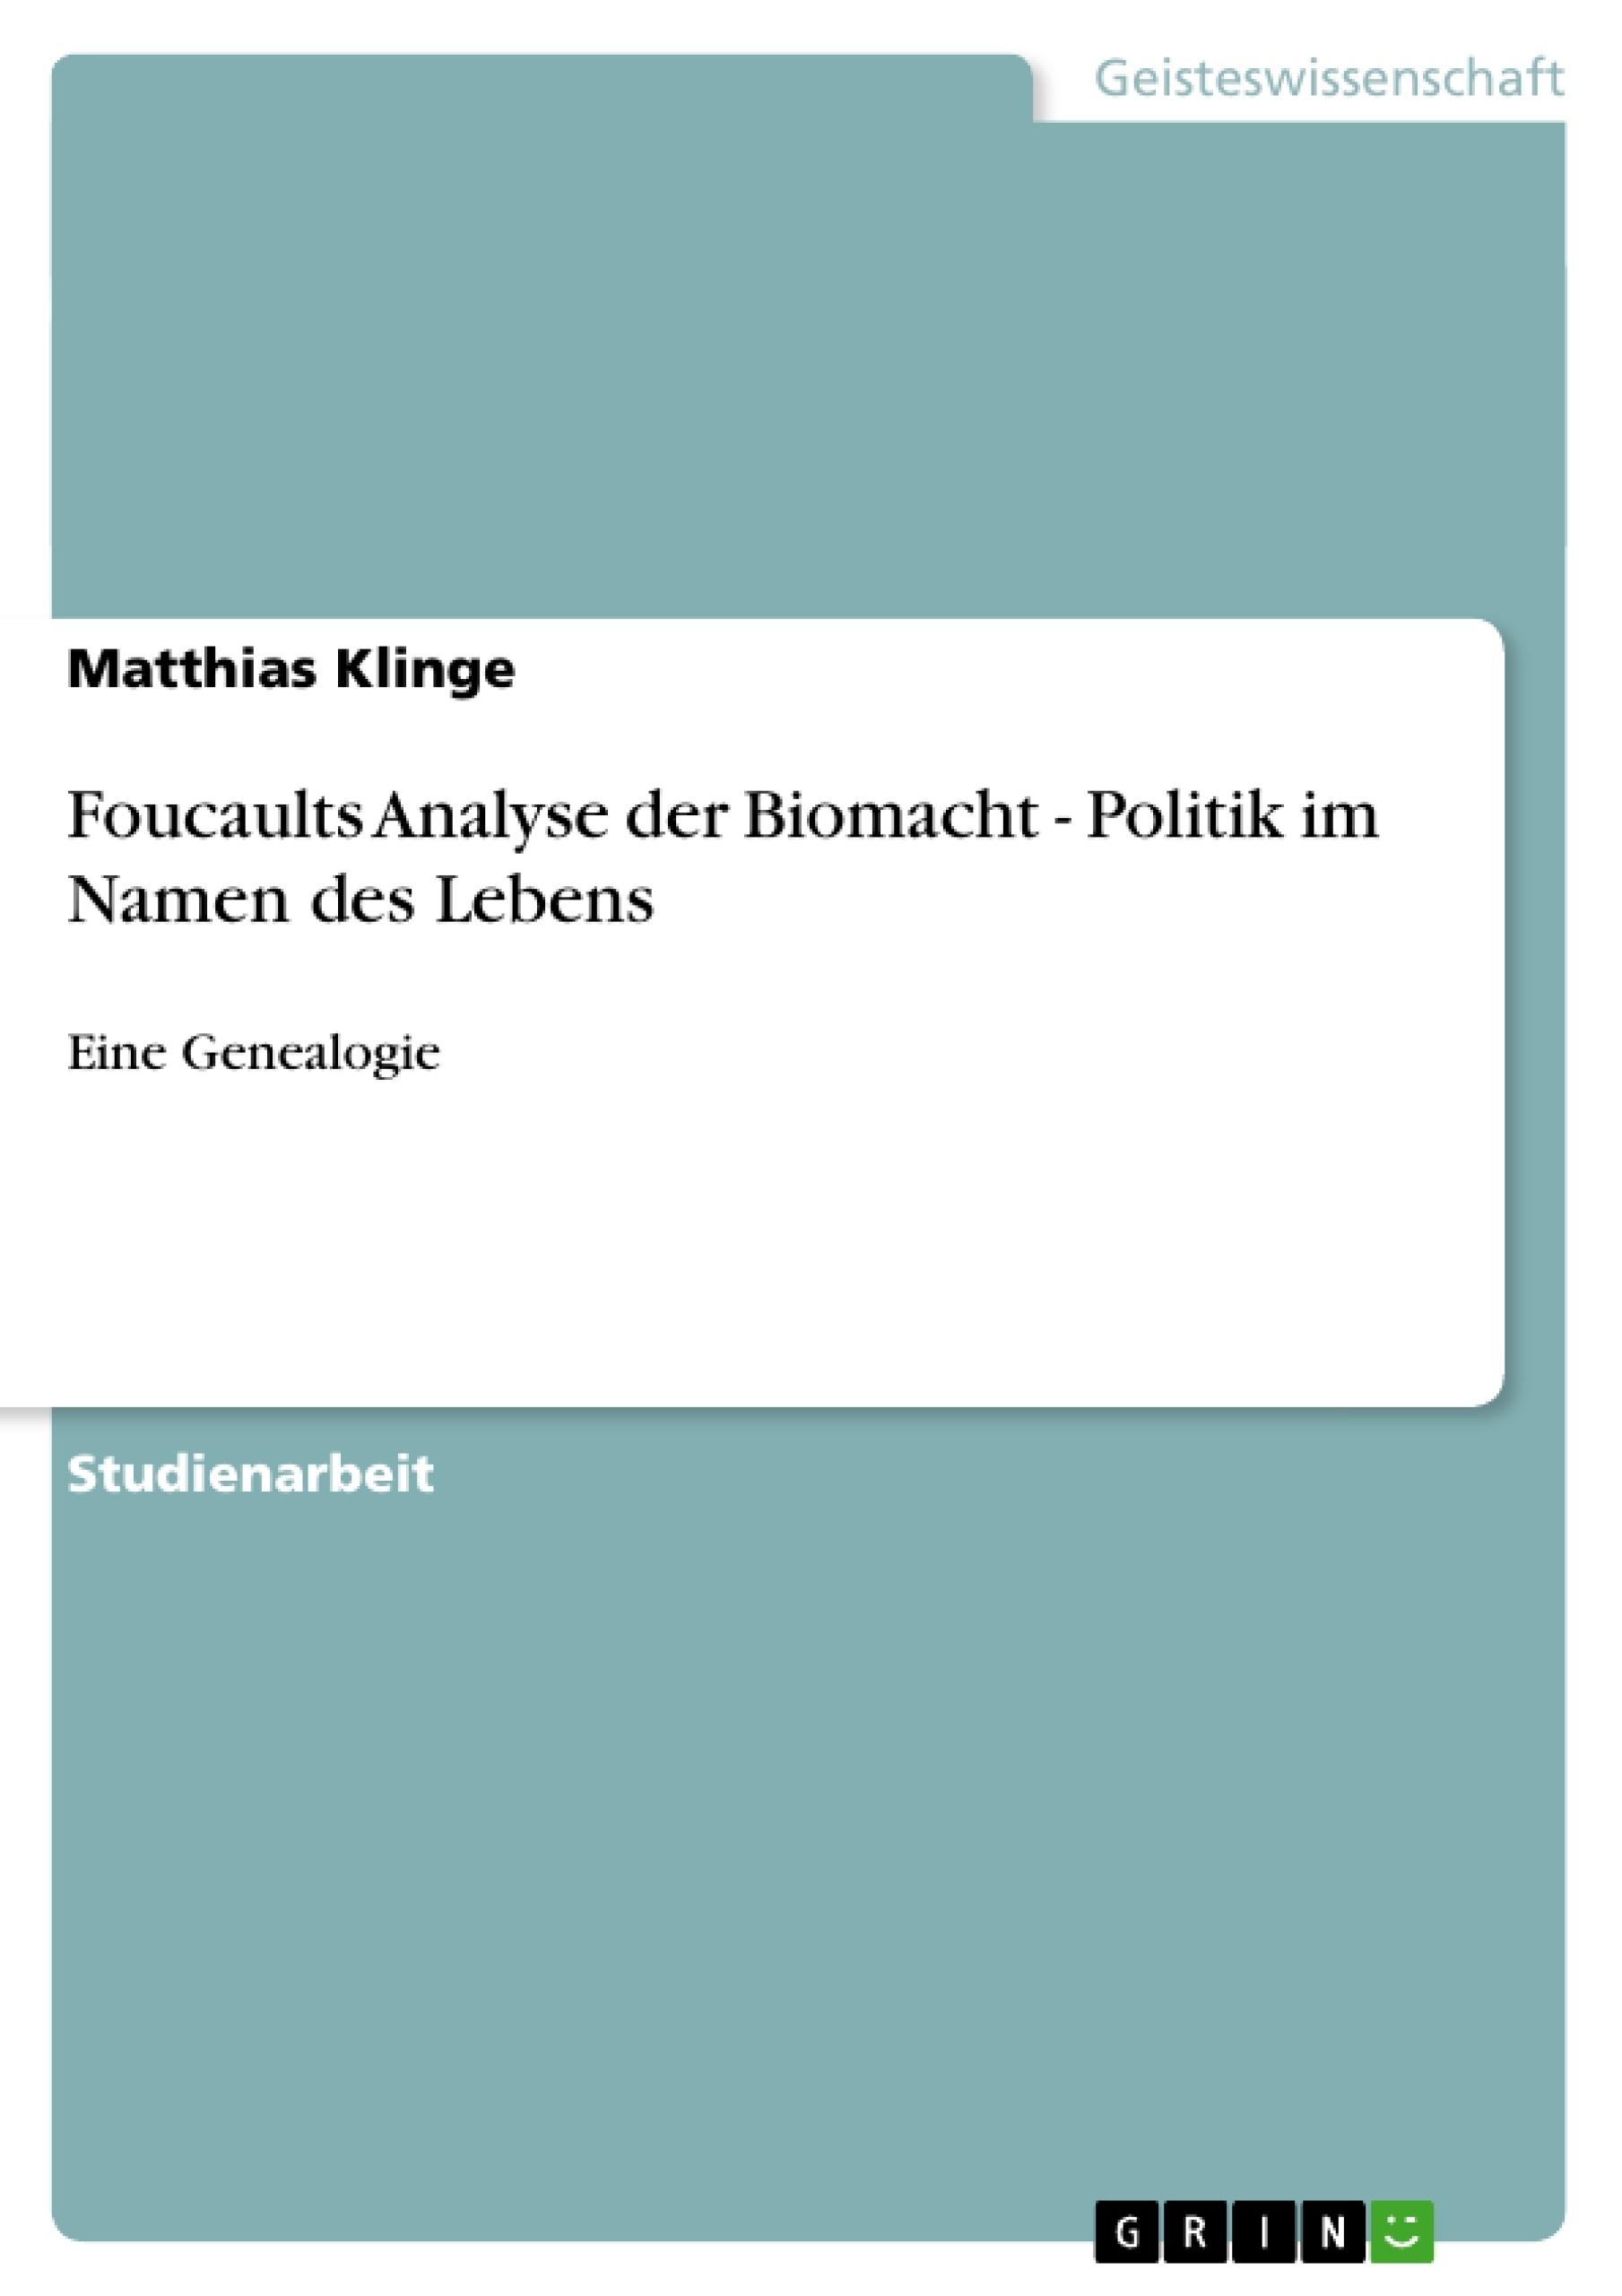 Titel: Foucaults Analyse der Biomacht - Politik im Namen des Lebens